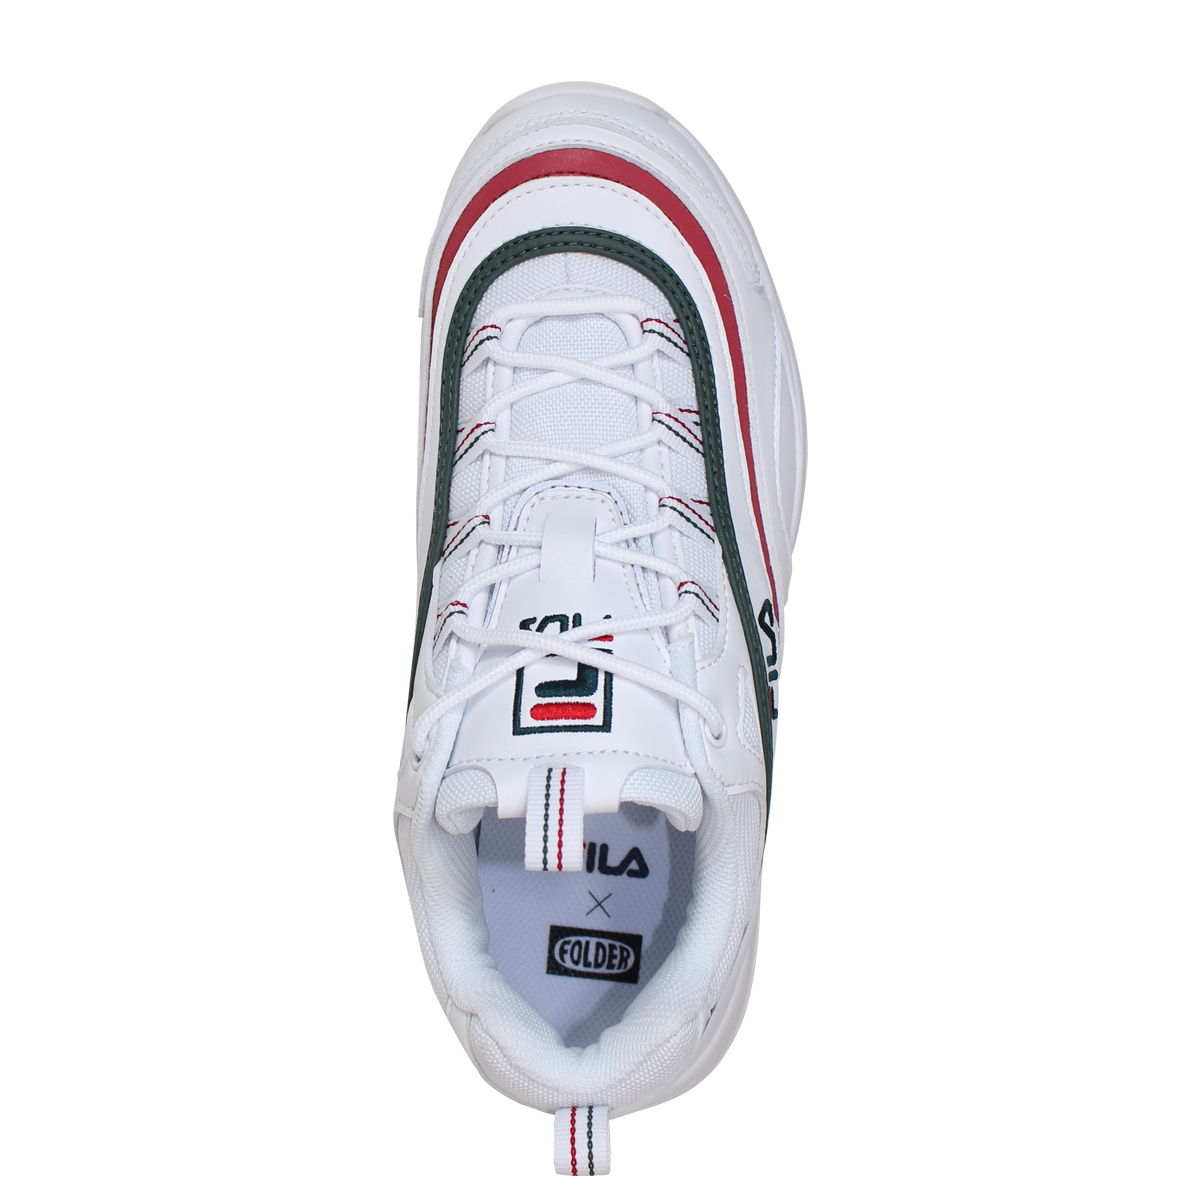 FILA FOLDER FILARAY SMU Fila Fila lei sneakers men gap Dis folder collaboration white FLFL8A1U10 FS1SIA1166X WGN